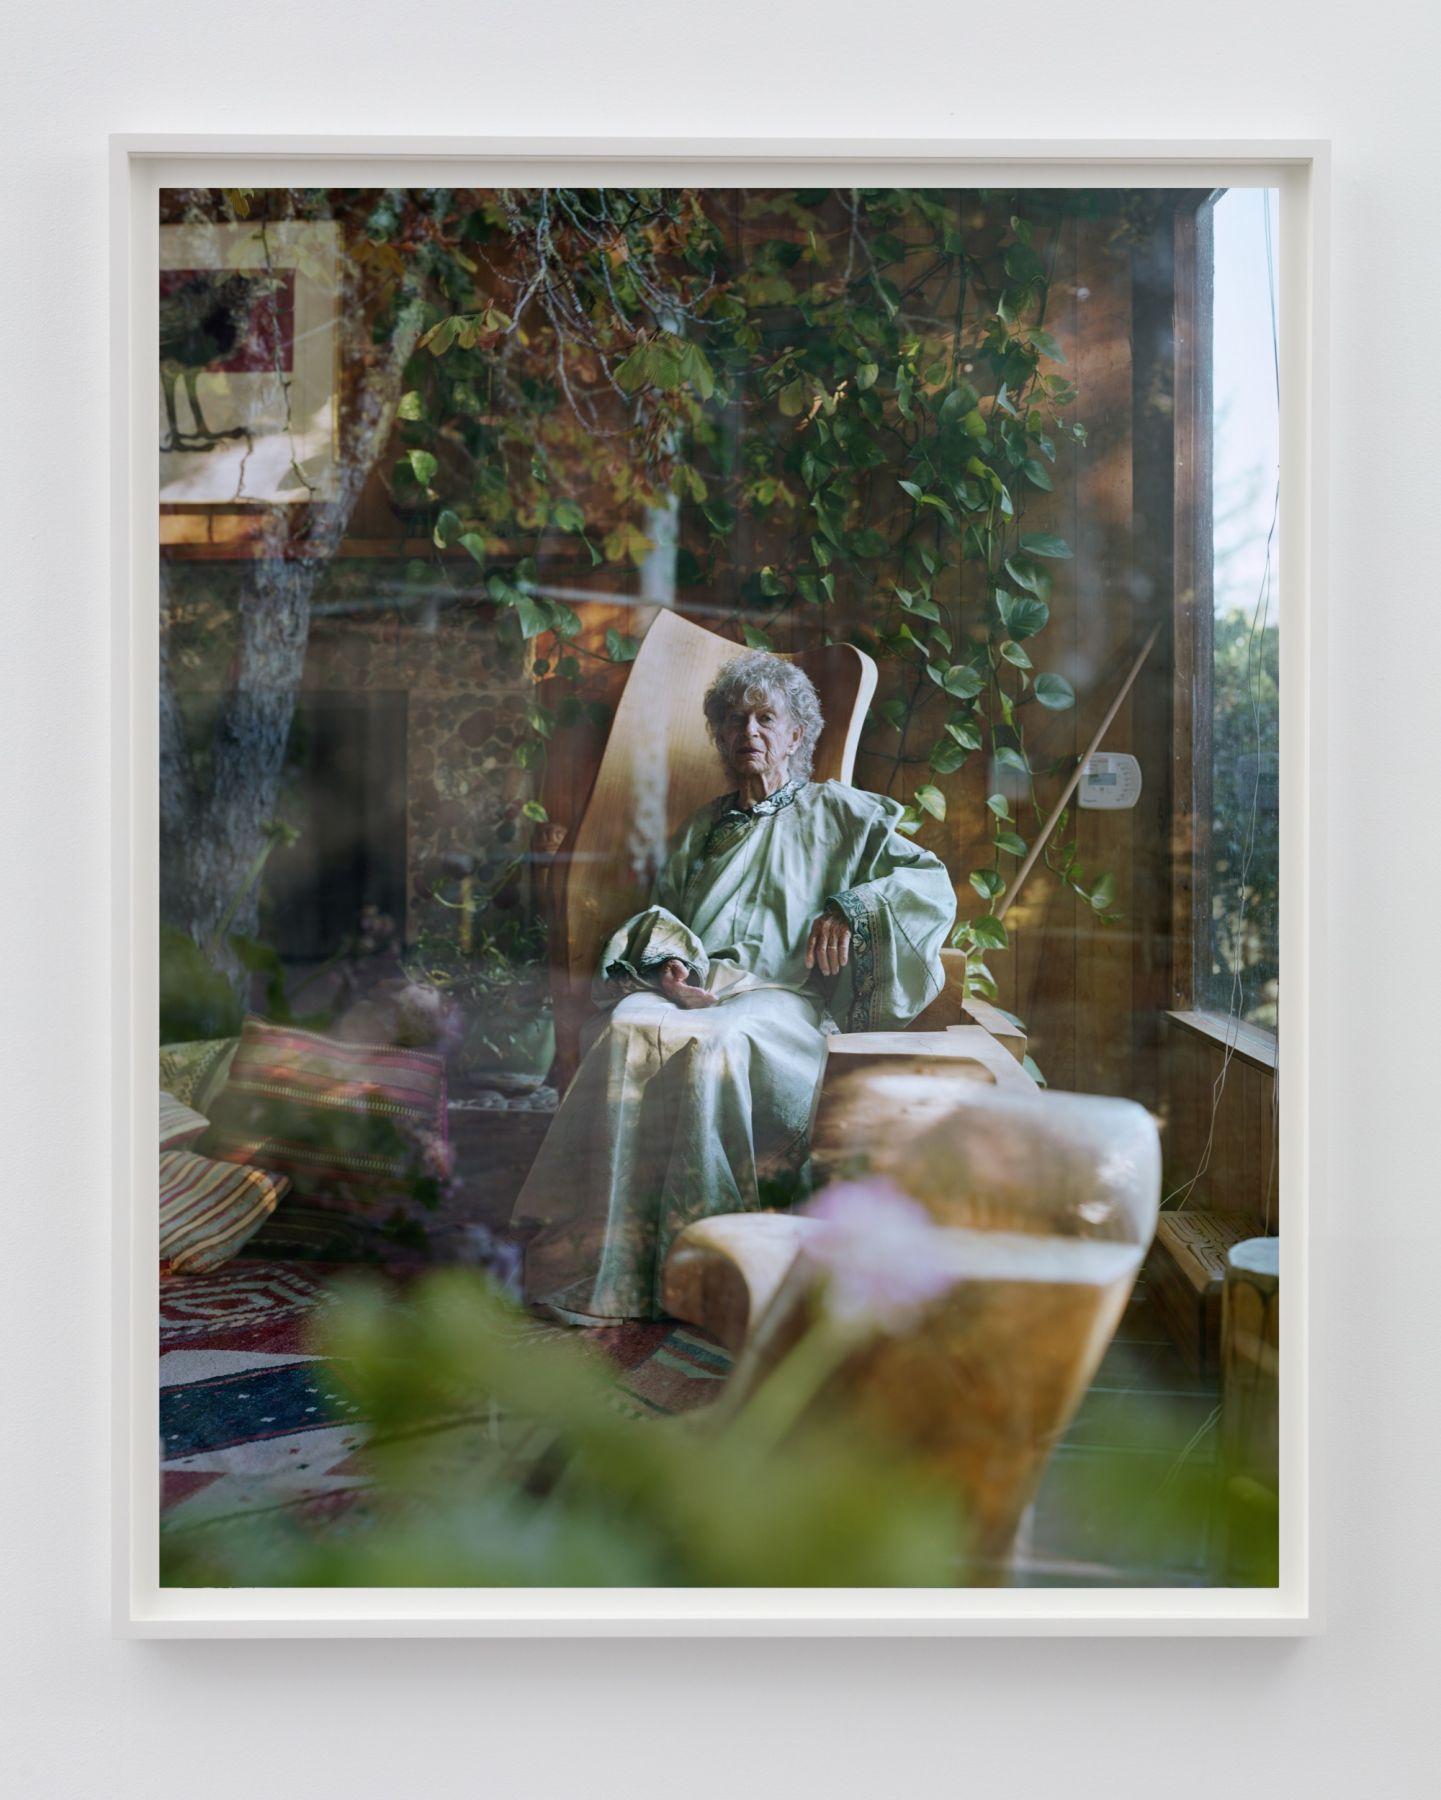 ALEC SOTH Anna. Kentfield, California, 2017